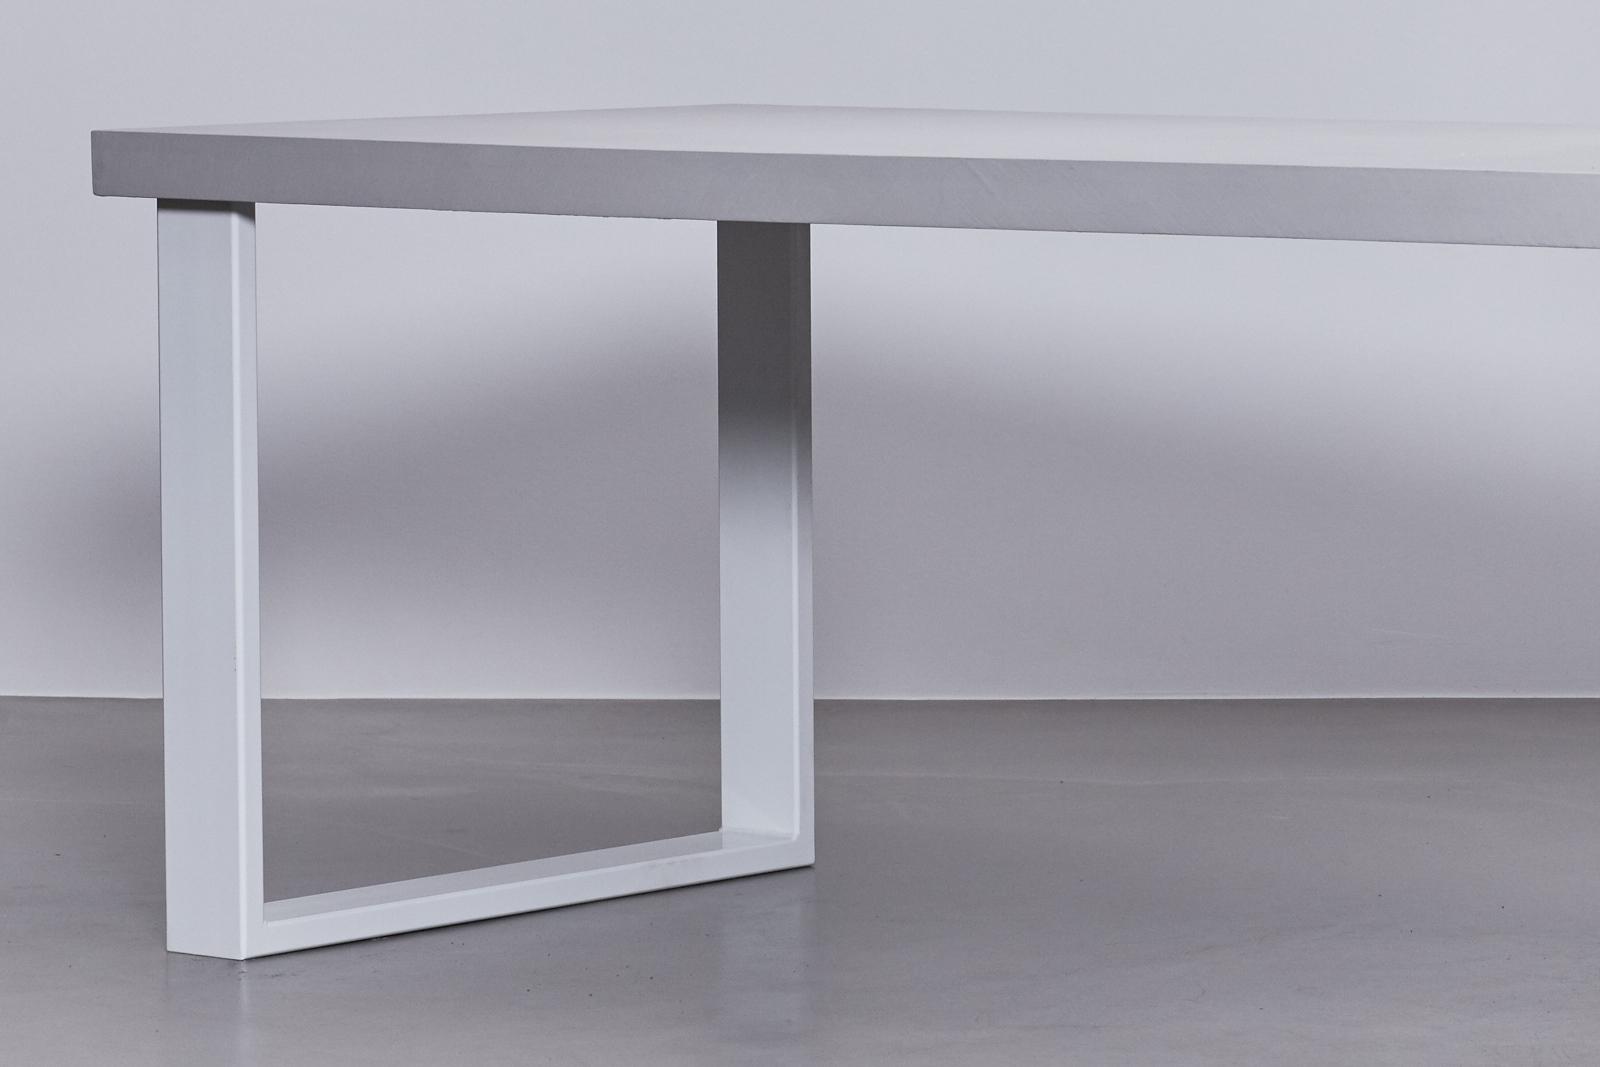 Betonlook Tafel  u2013 Onderstel Staal Wit  u2013 De Betonfabriek